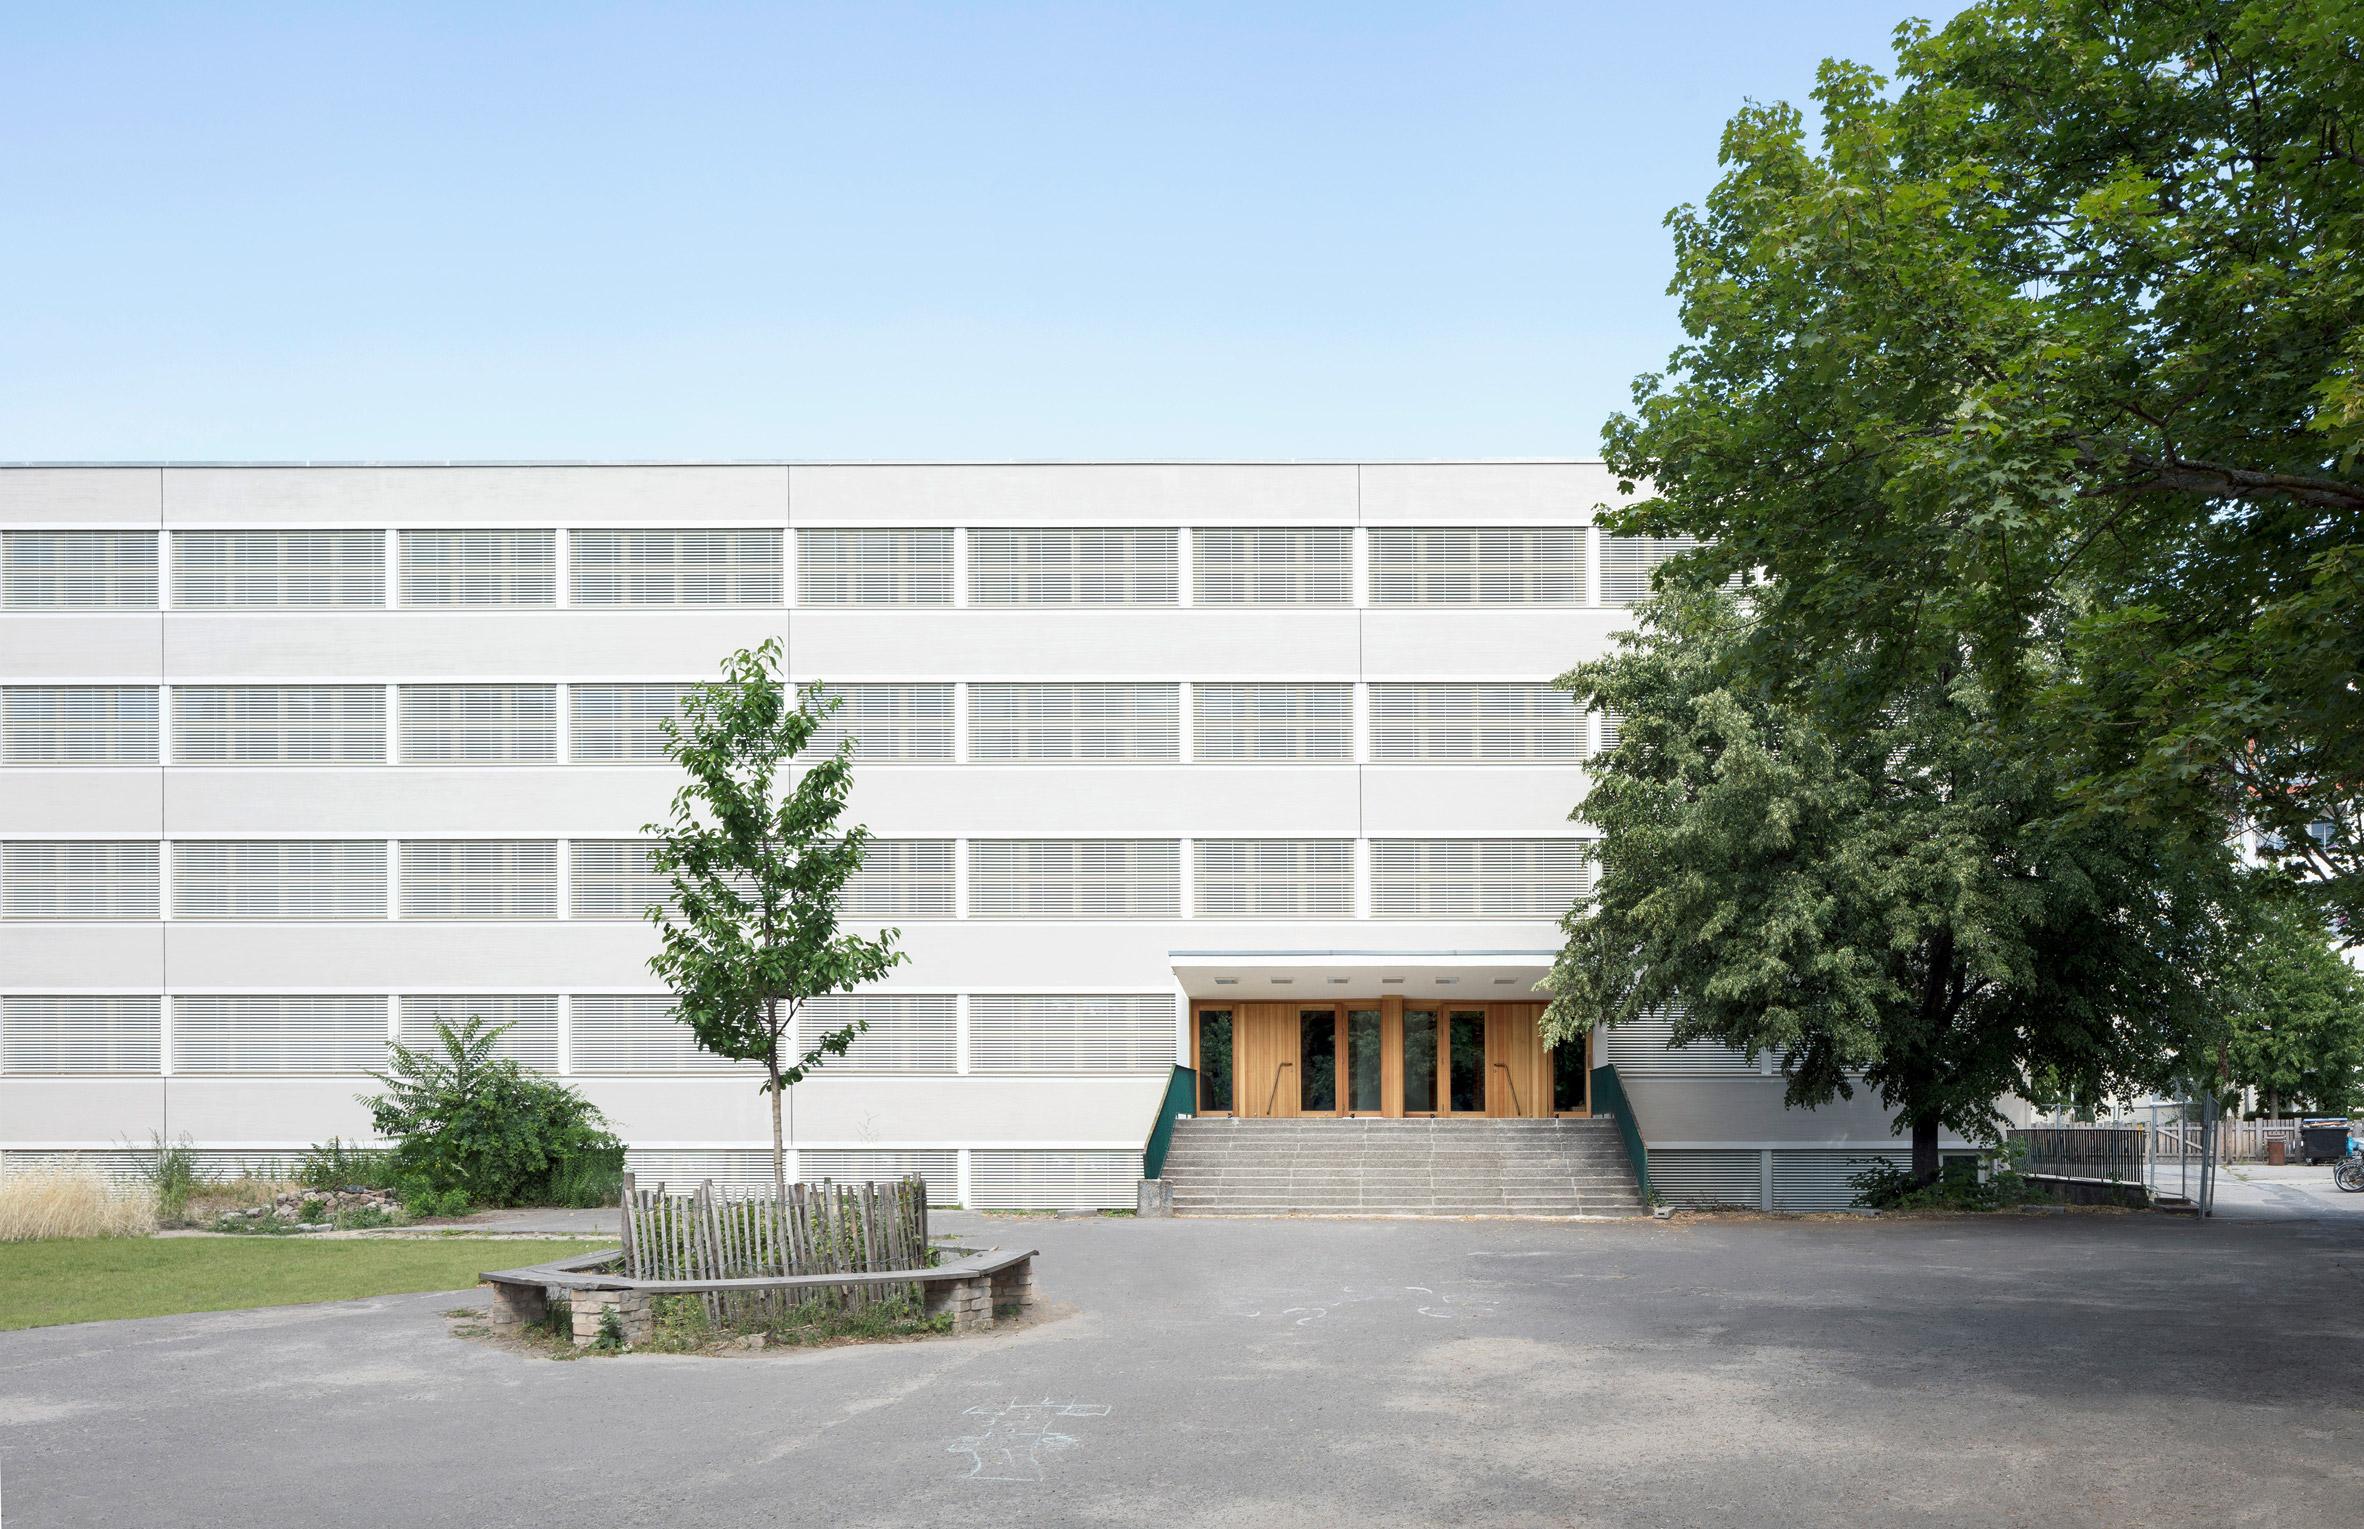 Extensions berlin pankow